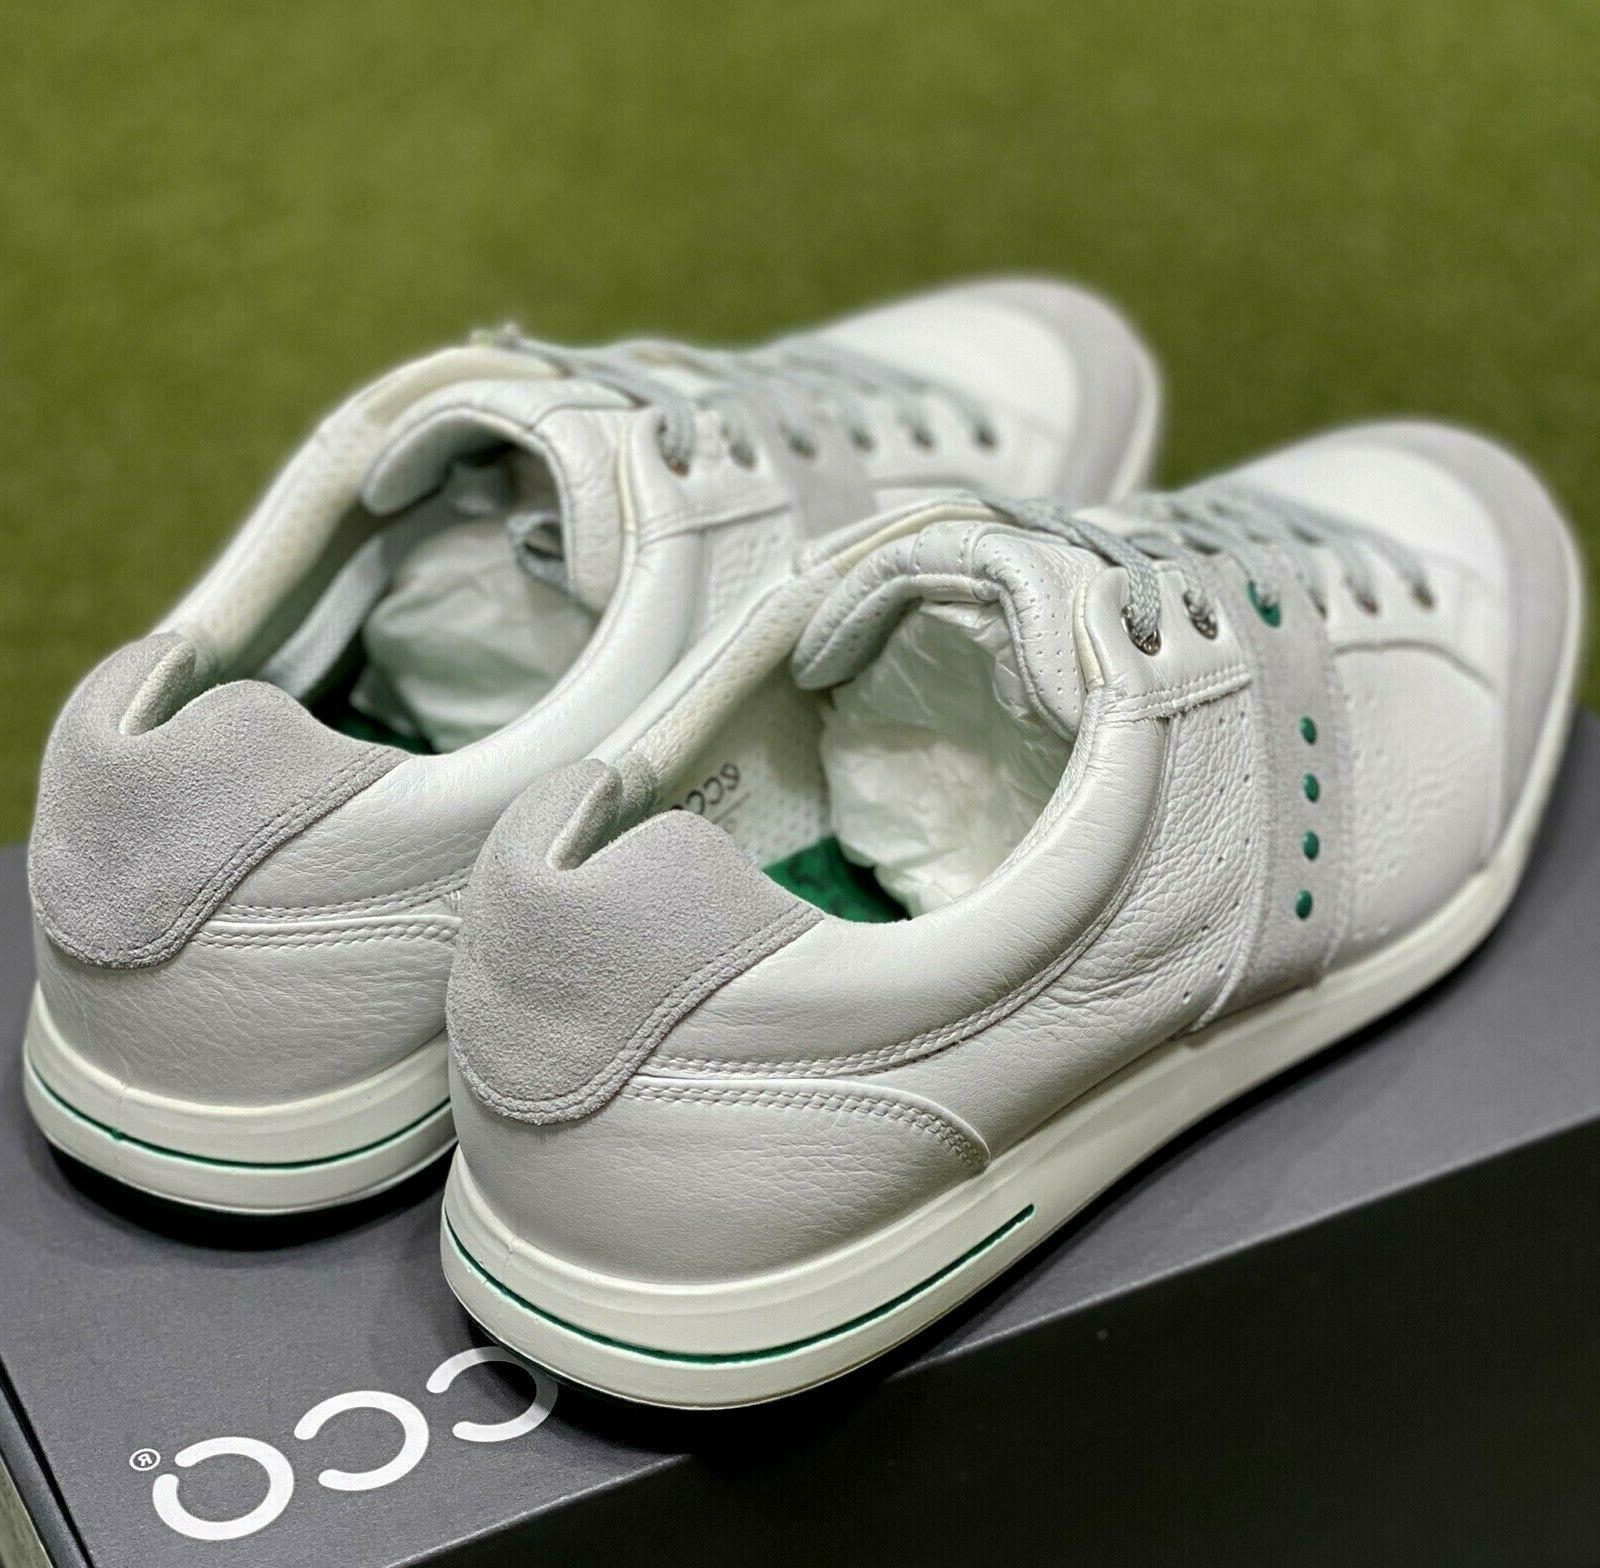 Couples Golf Size 43 Concrete/Green